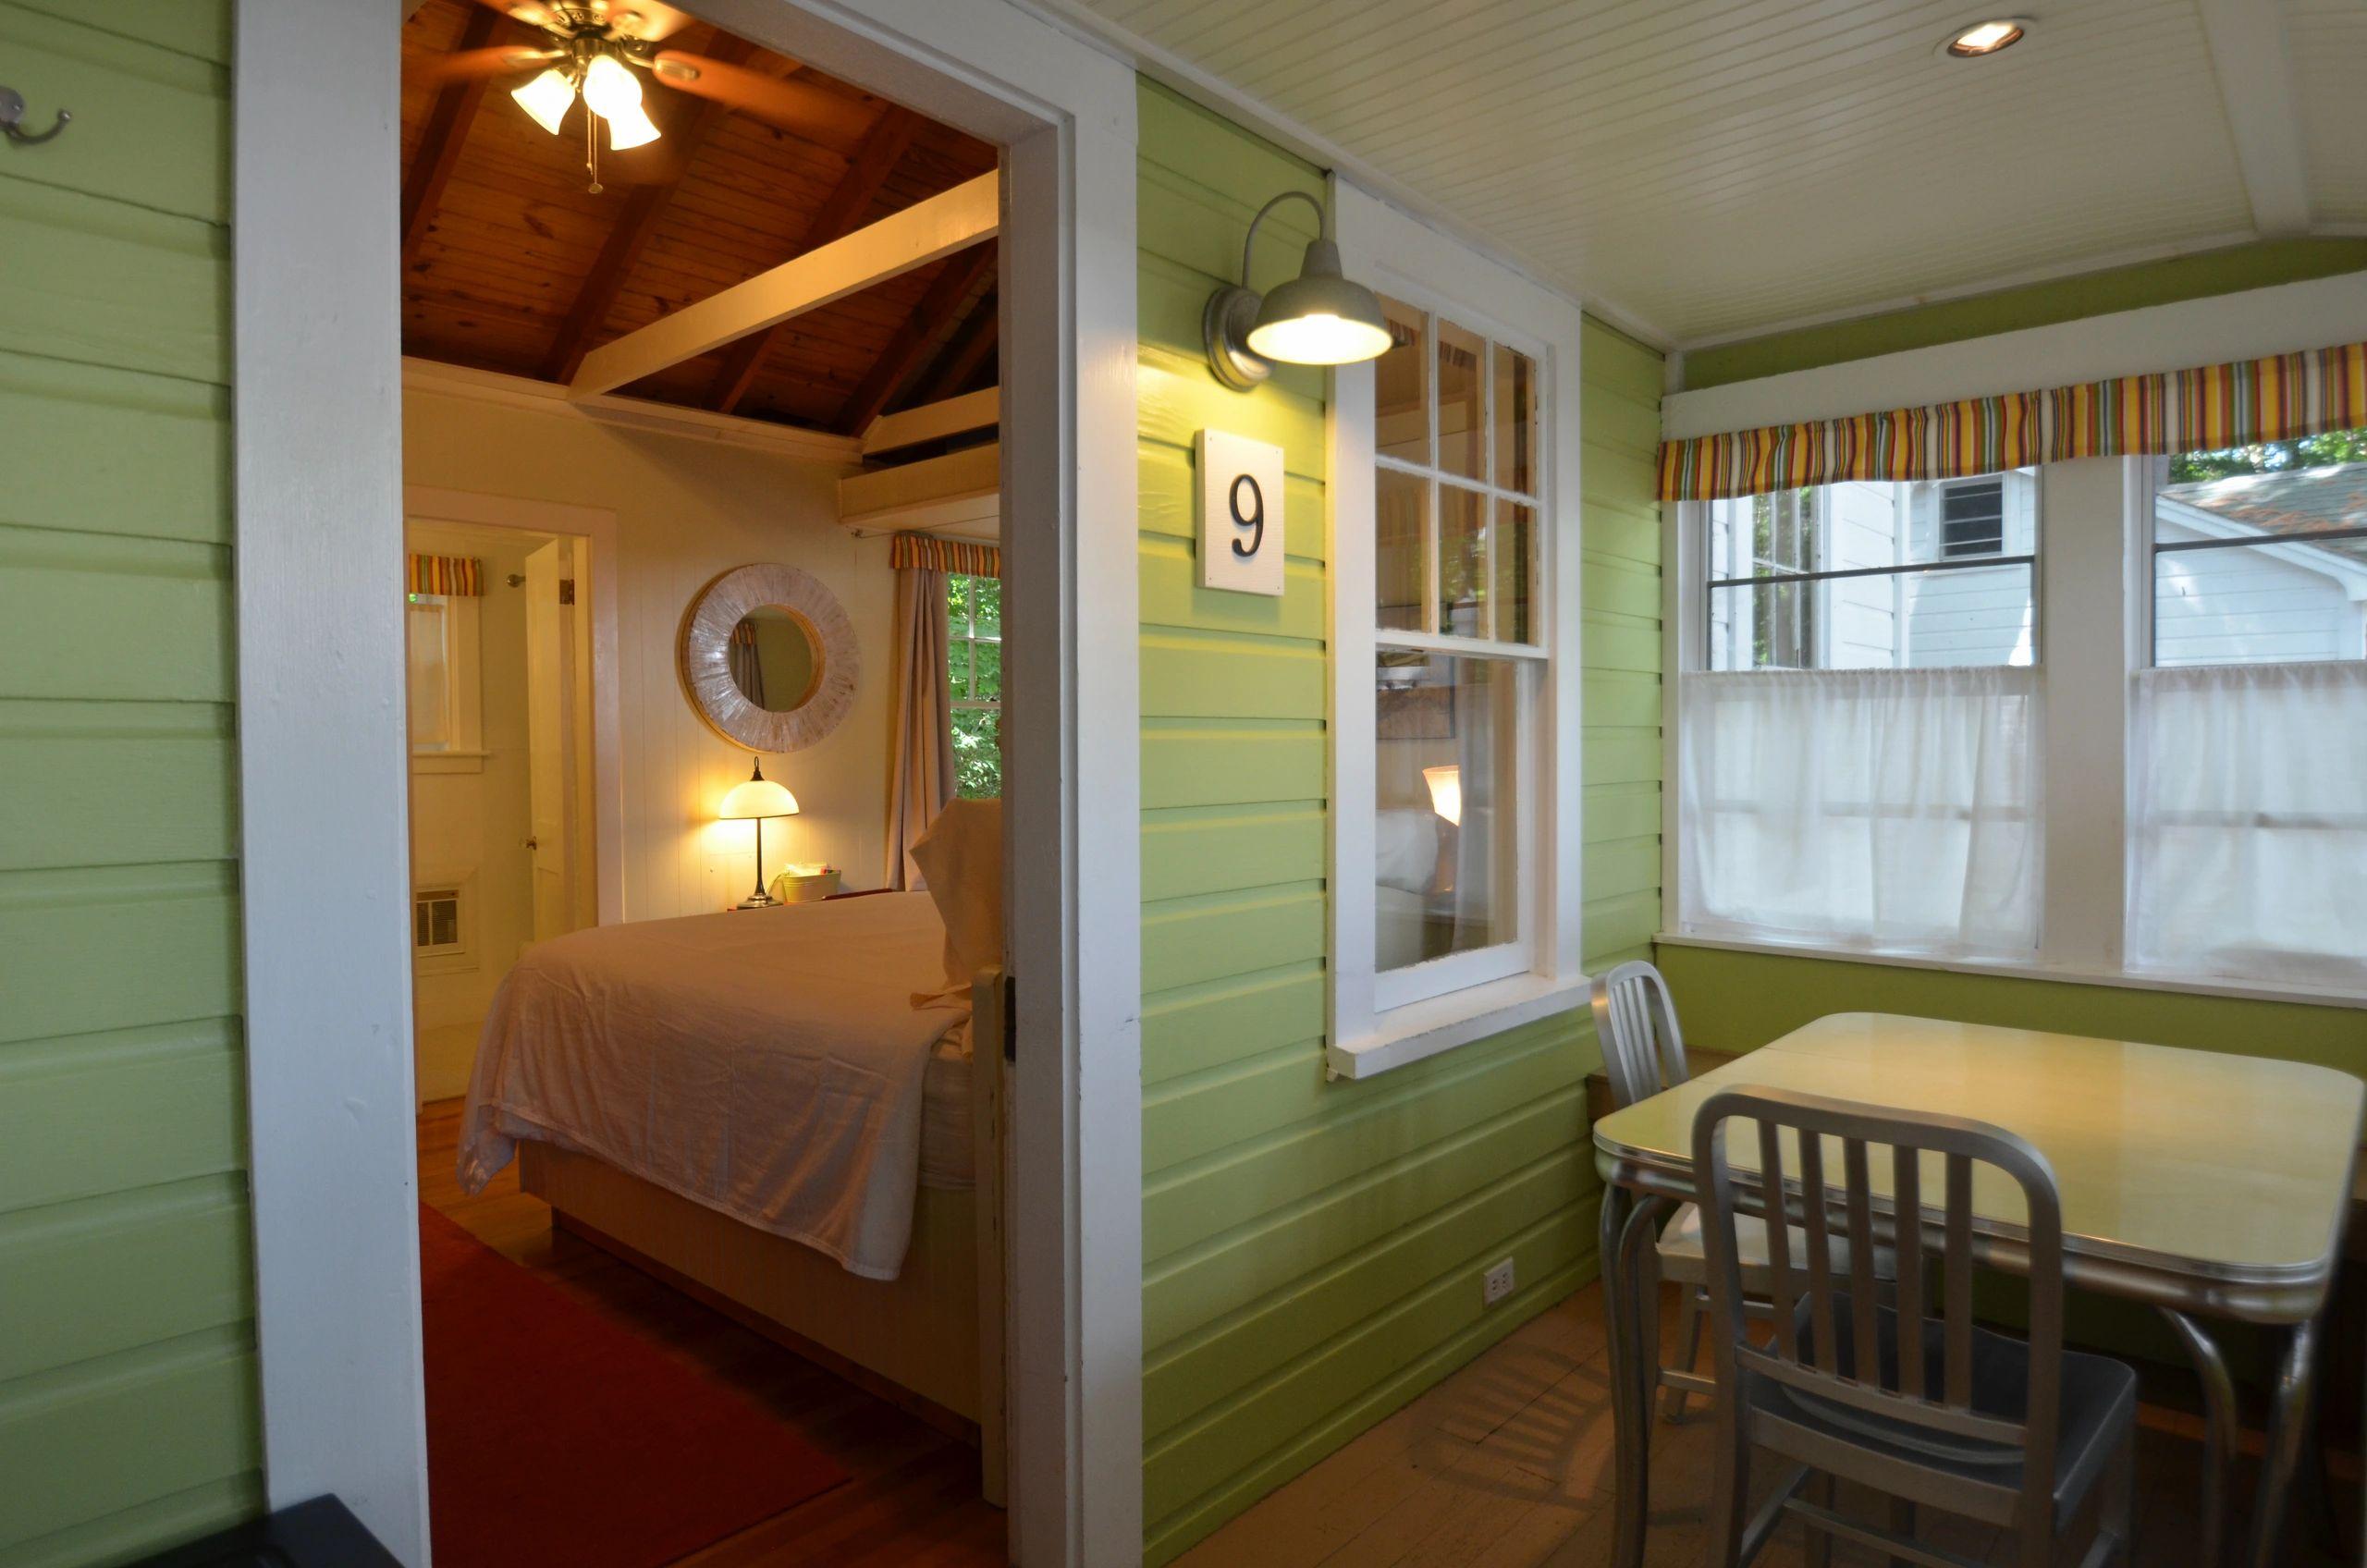 Cabin Rentals and Lodging in New Hampshire, Lake Winnipesaukee